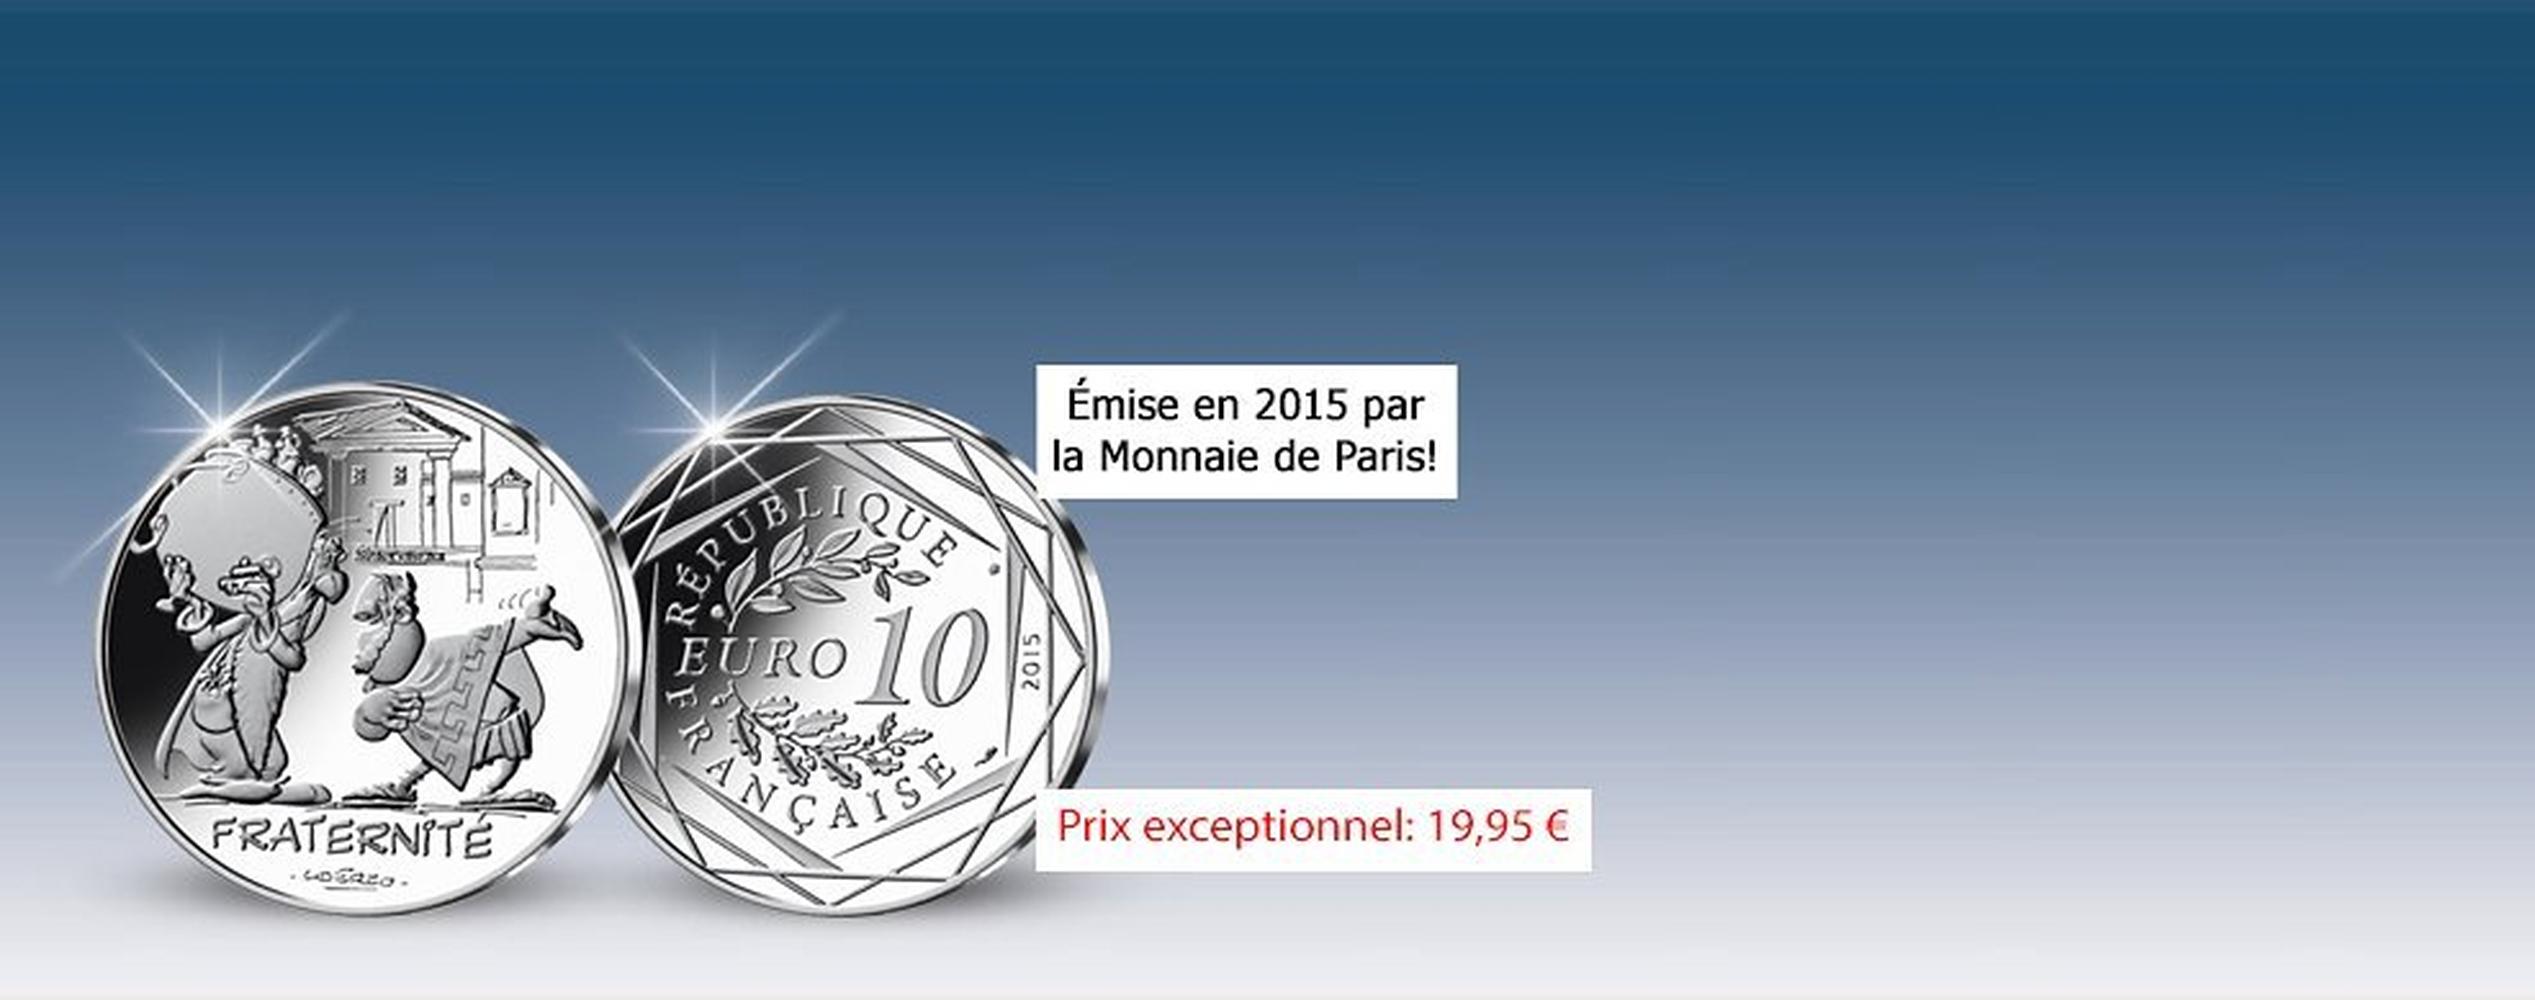 MDM - pièce 10 Euros Fraternité Panoramix - Astérix 2015